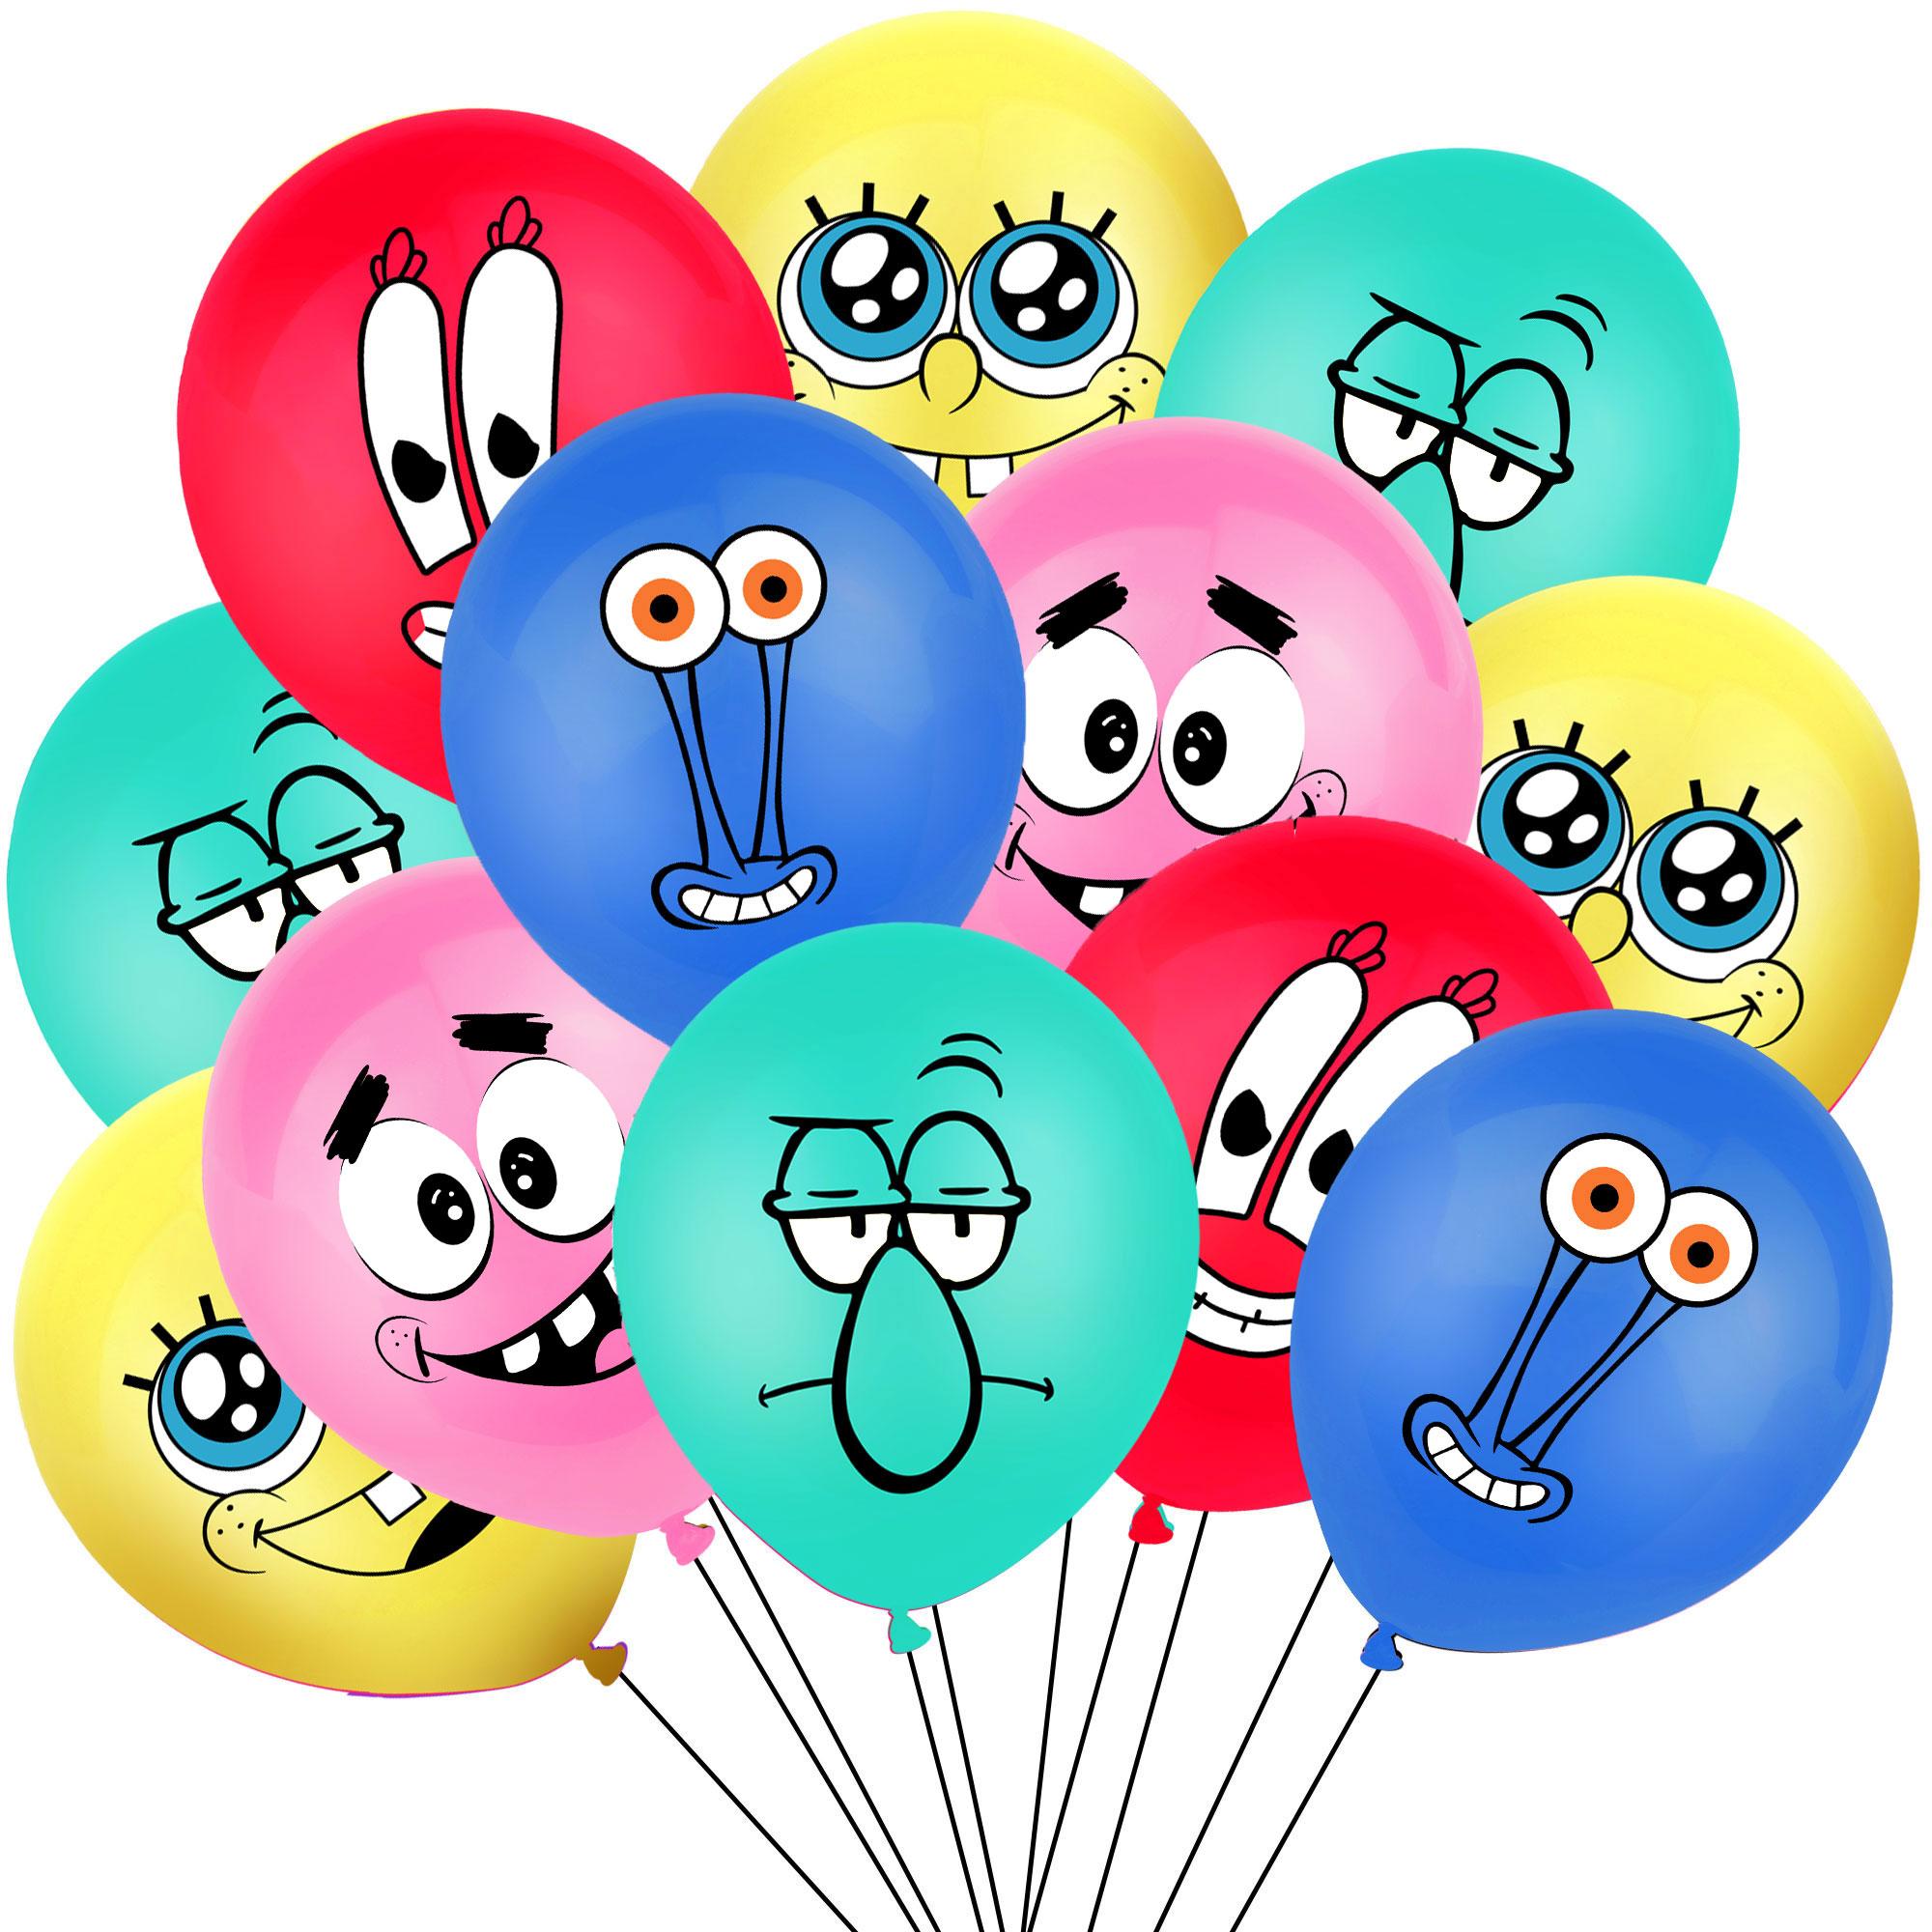 10Pcs Sponge Party Supplies Boy or Girl Bob Latex Balloons Happy Birthday Cartoon Theme Decoration Kids Ballon Party Decor